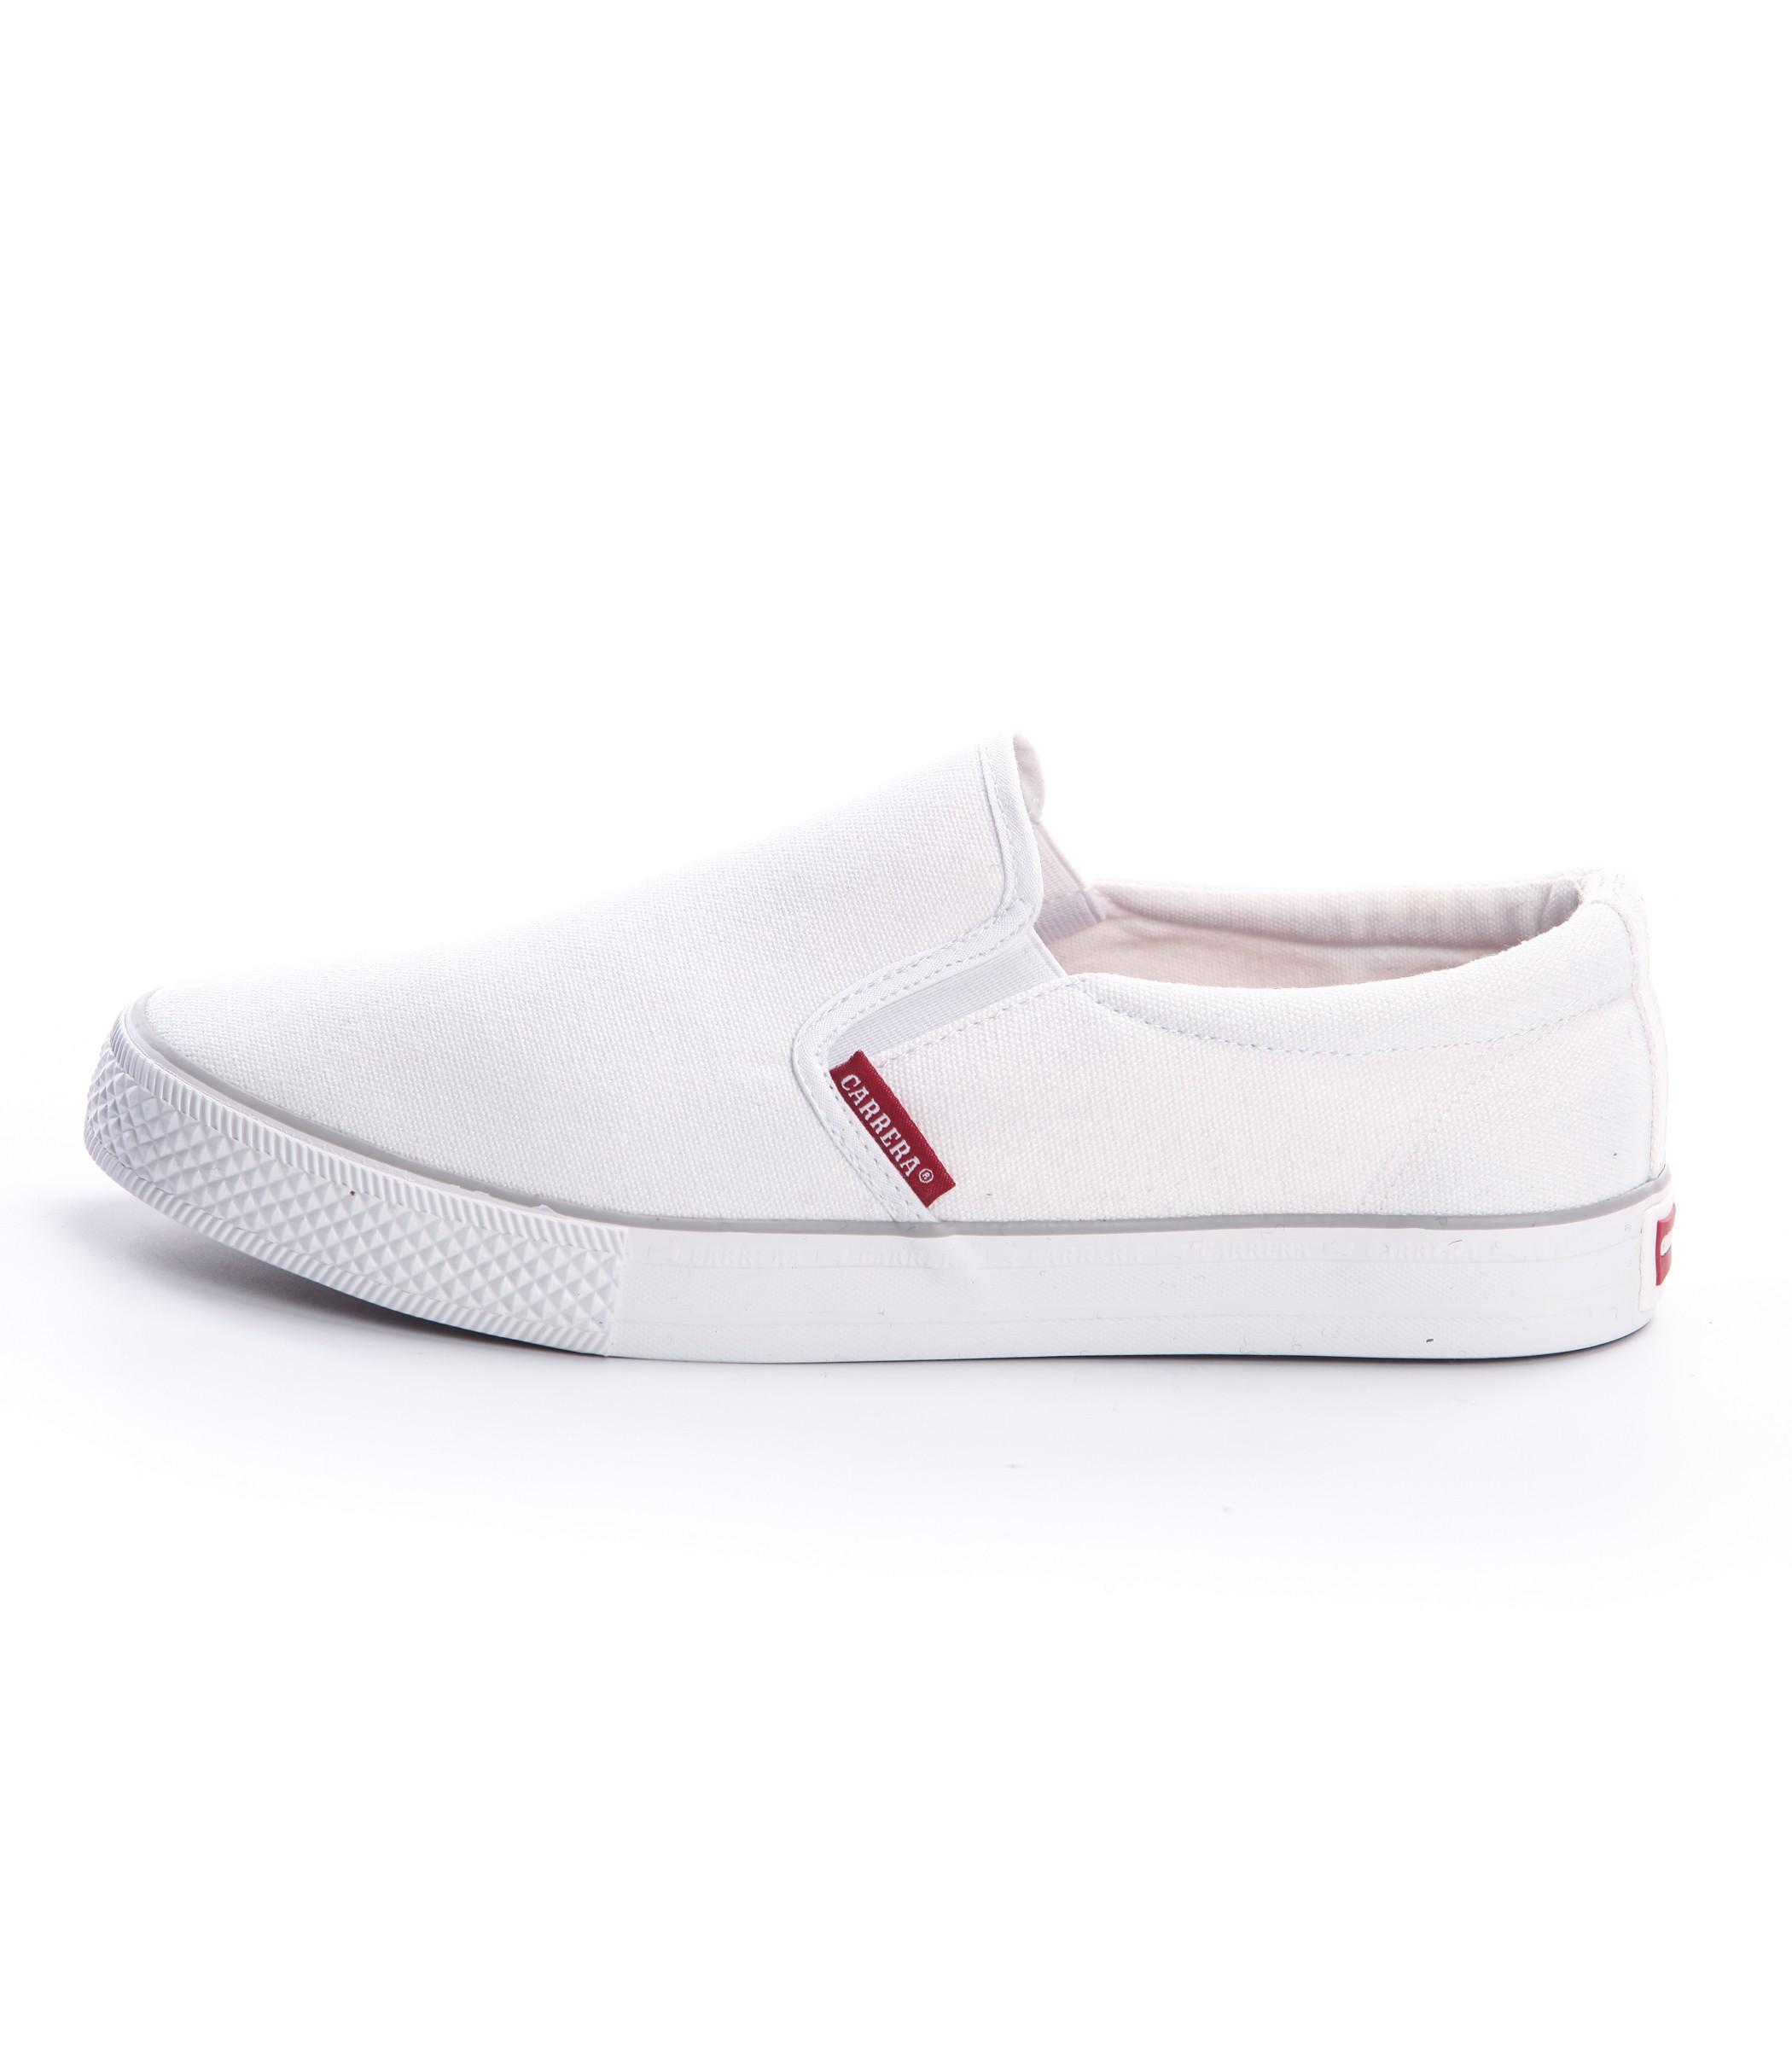 Scarpe Sneakers Carrera basse in tela senza lacci da uomo